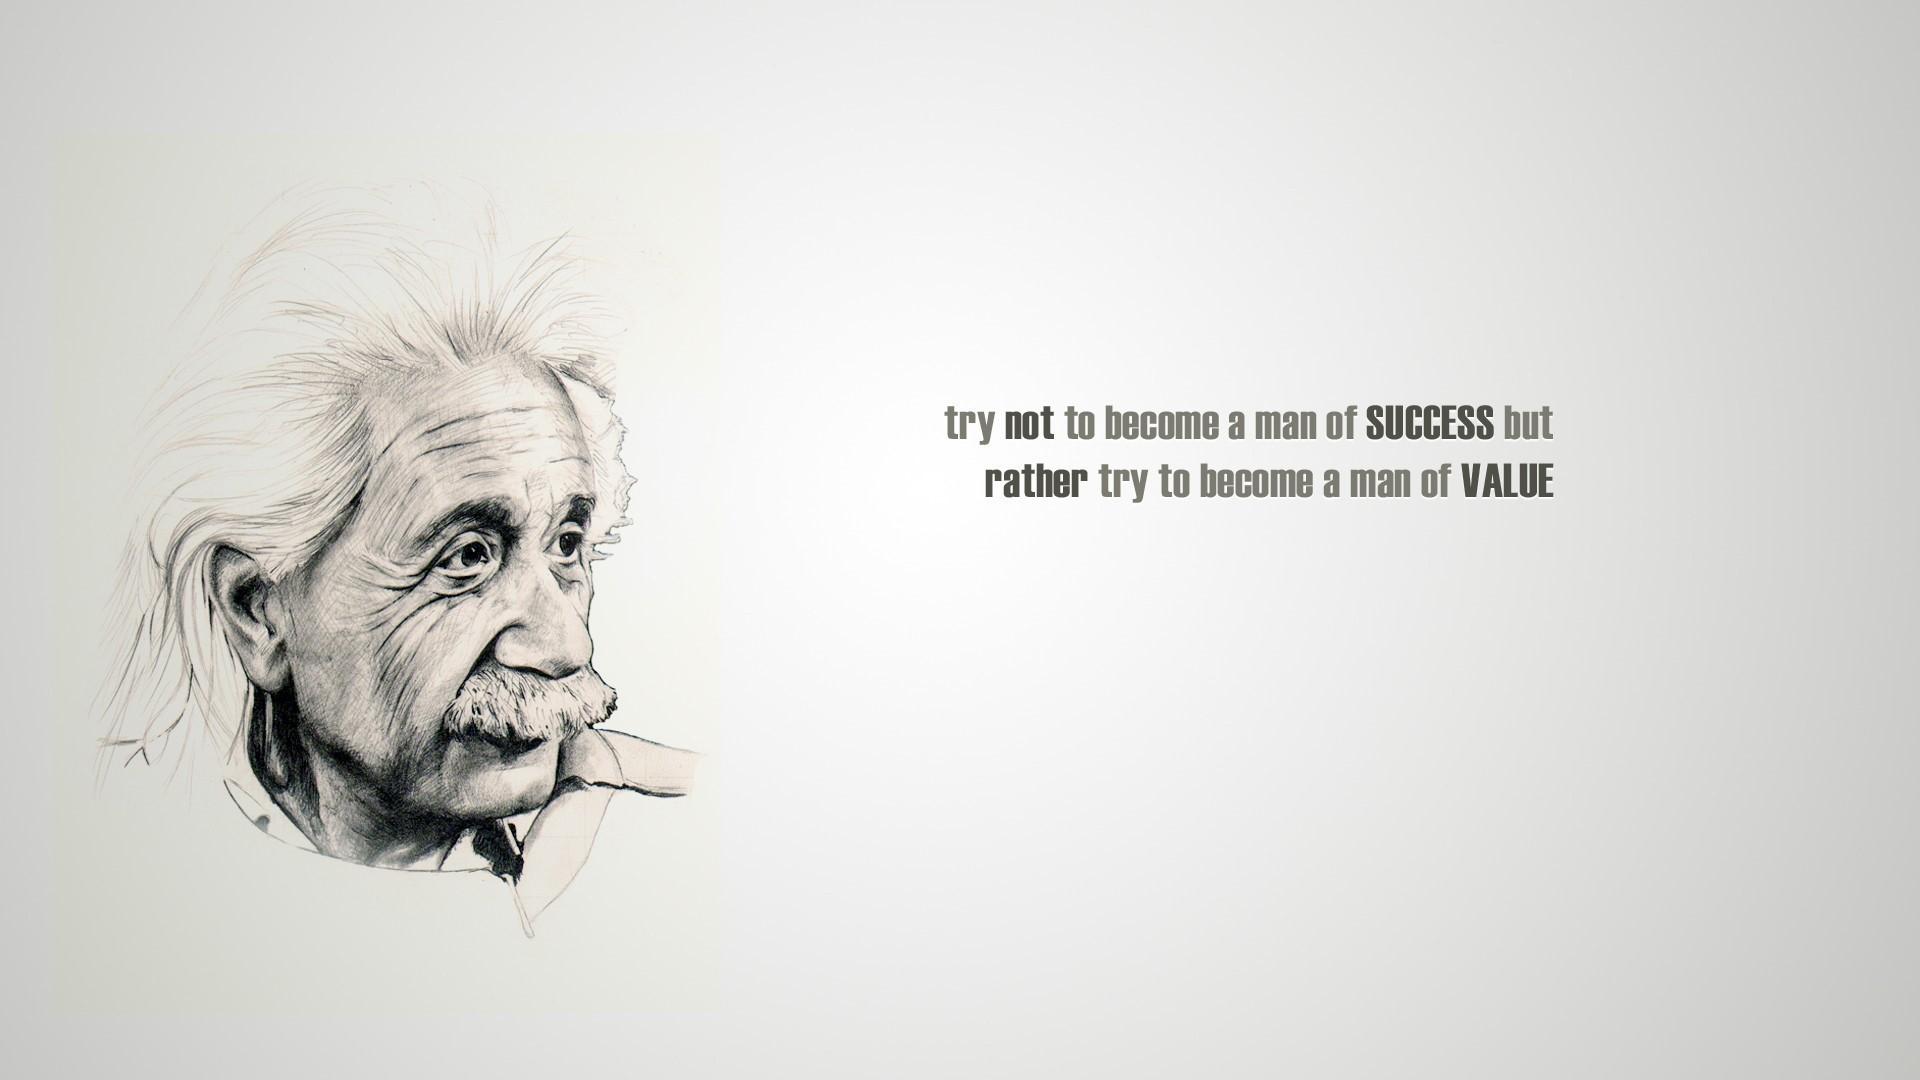 Free Albert Einstein Quote Hd Wallpaper For Desktop And Mobiles